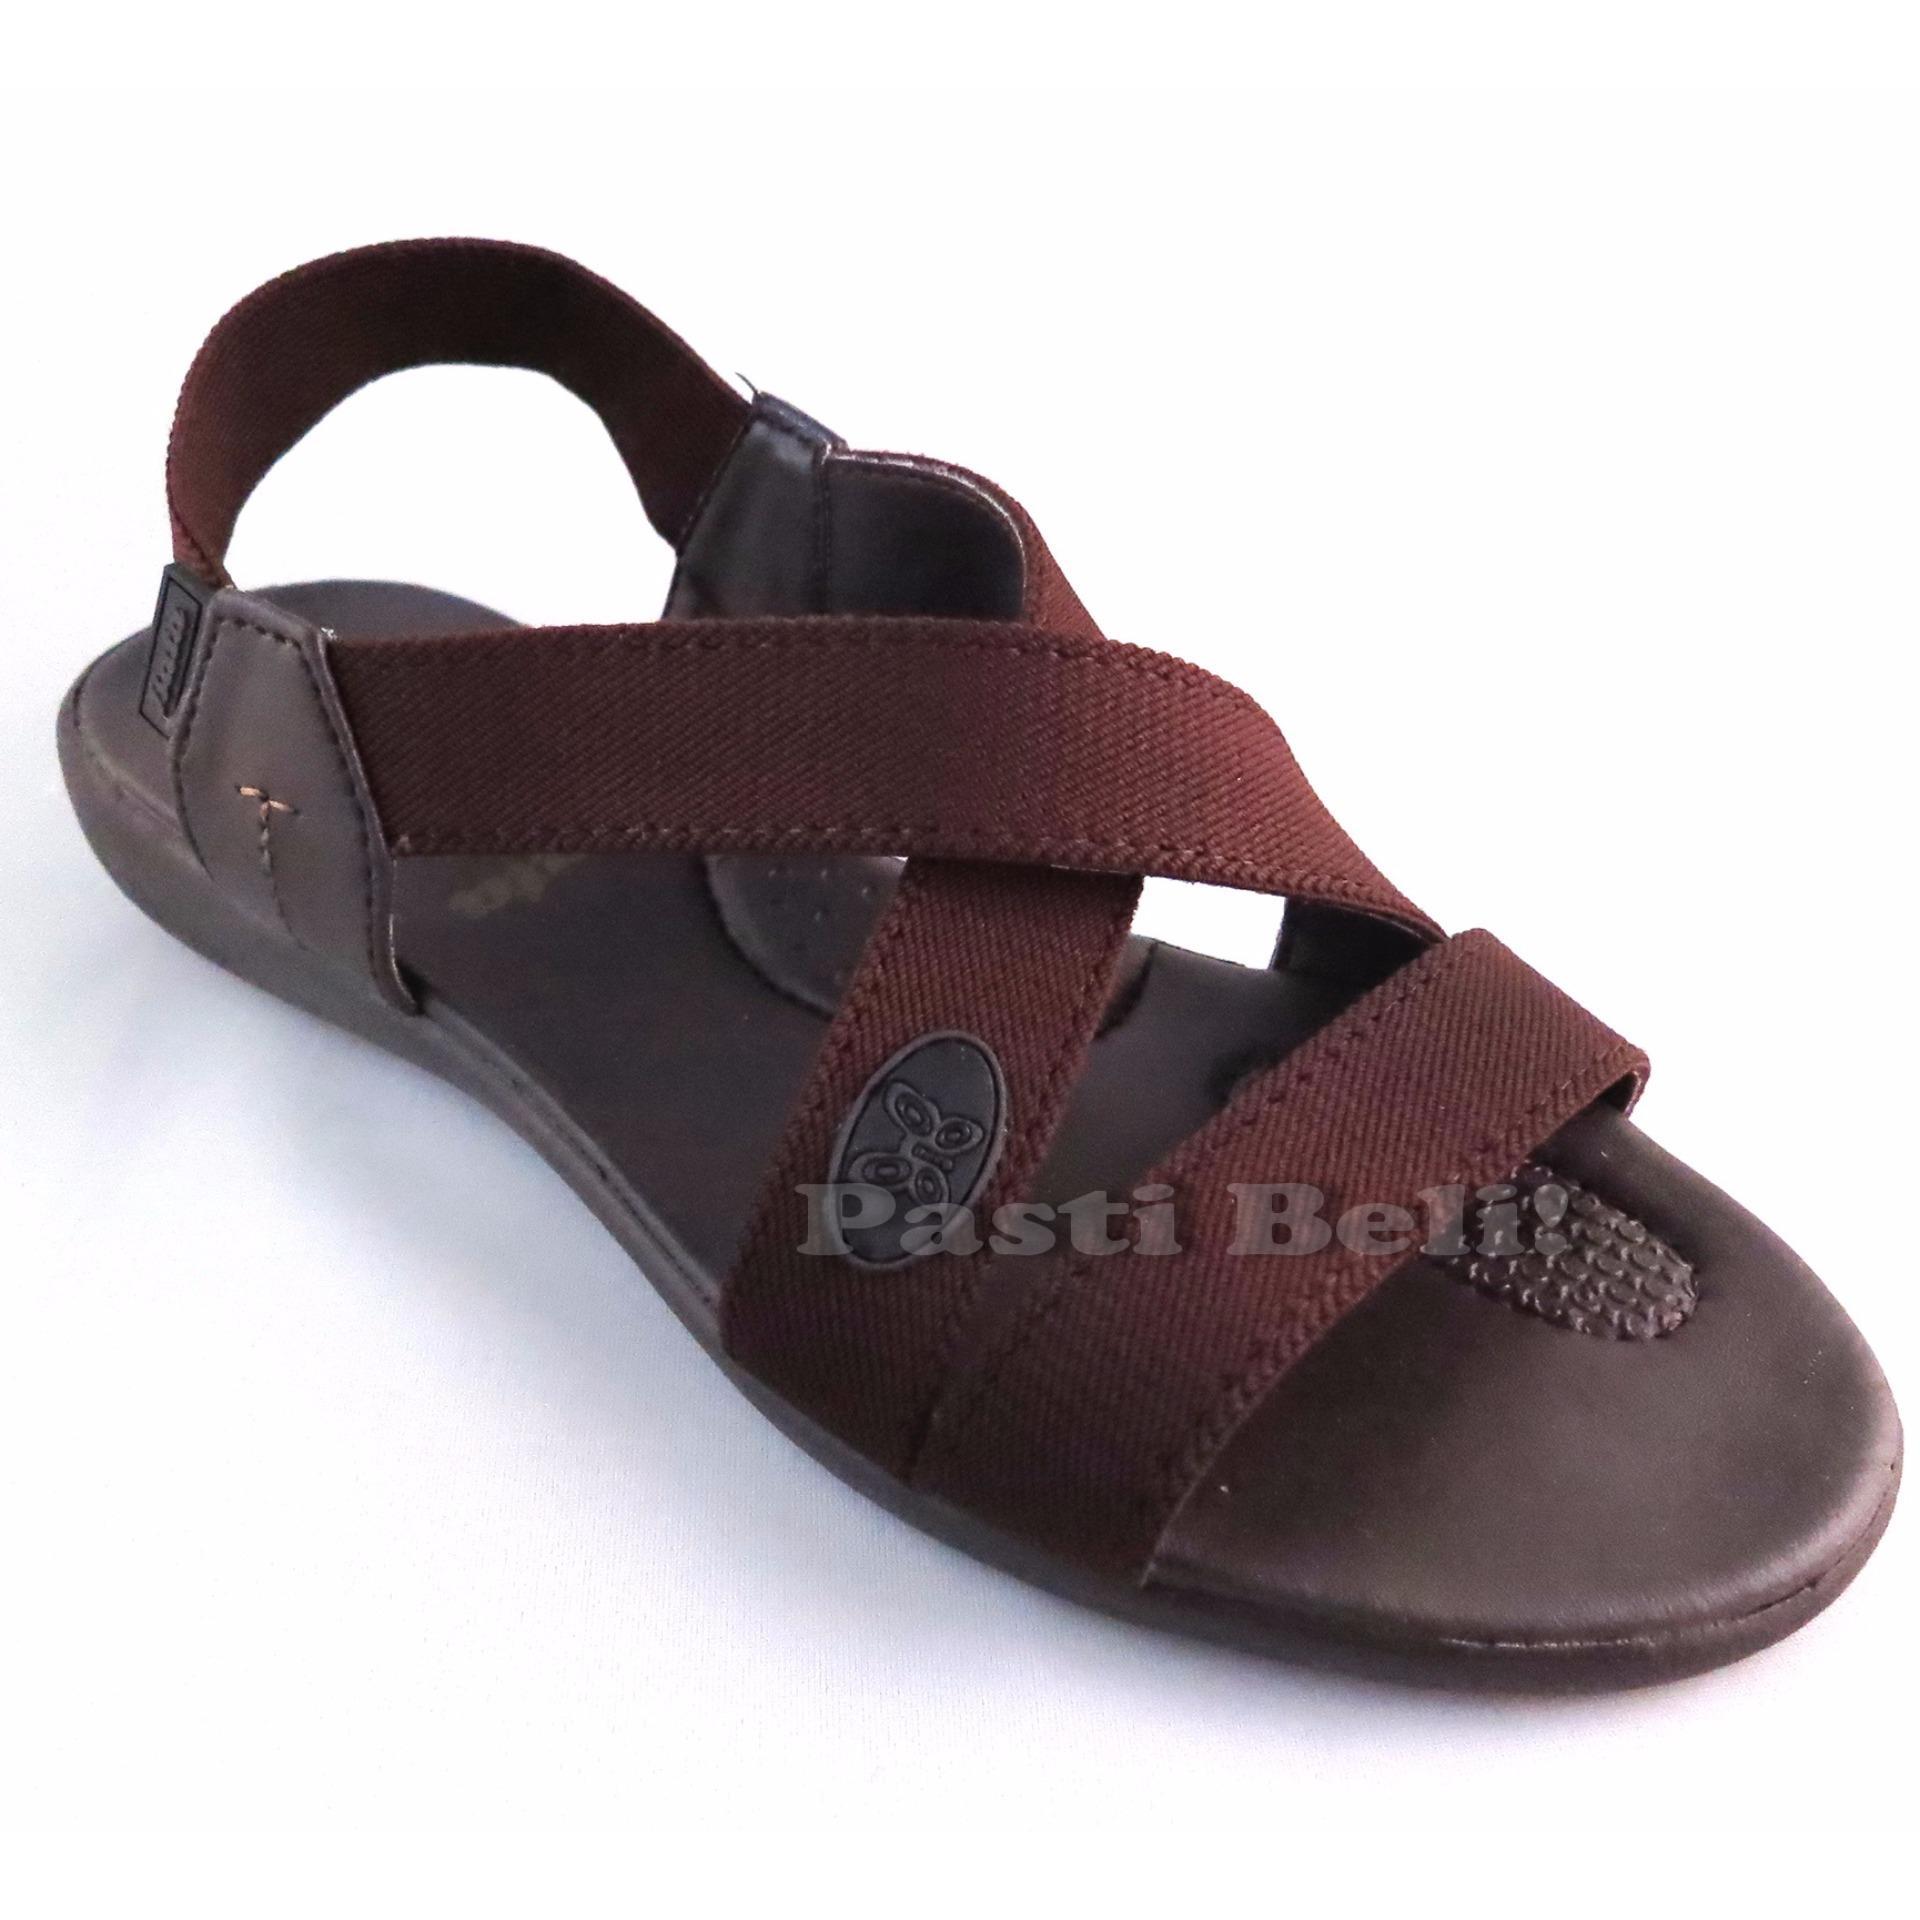 Toko Bata Sandal Wanita Cantik Coklat 661 4500 Murah Di North Sumatra